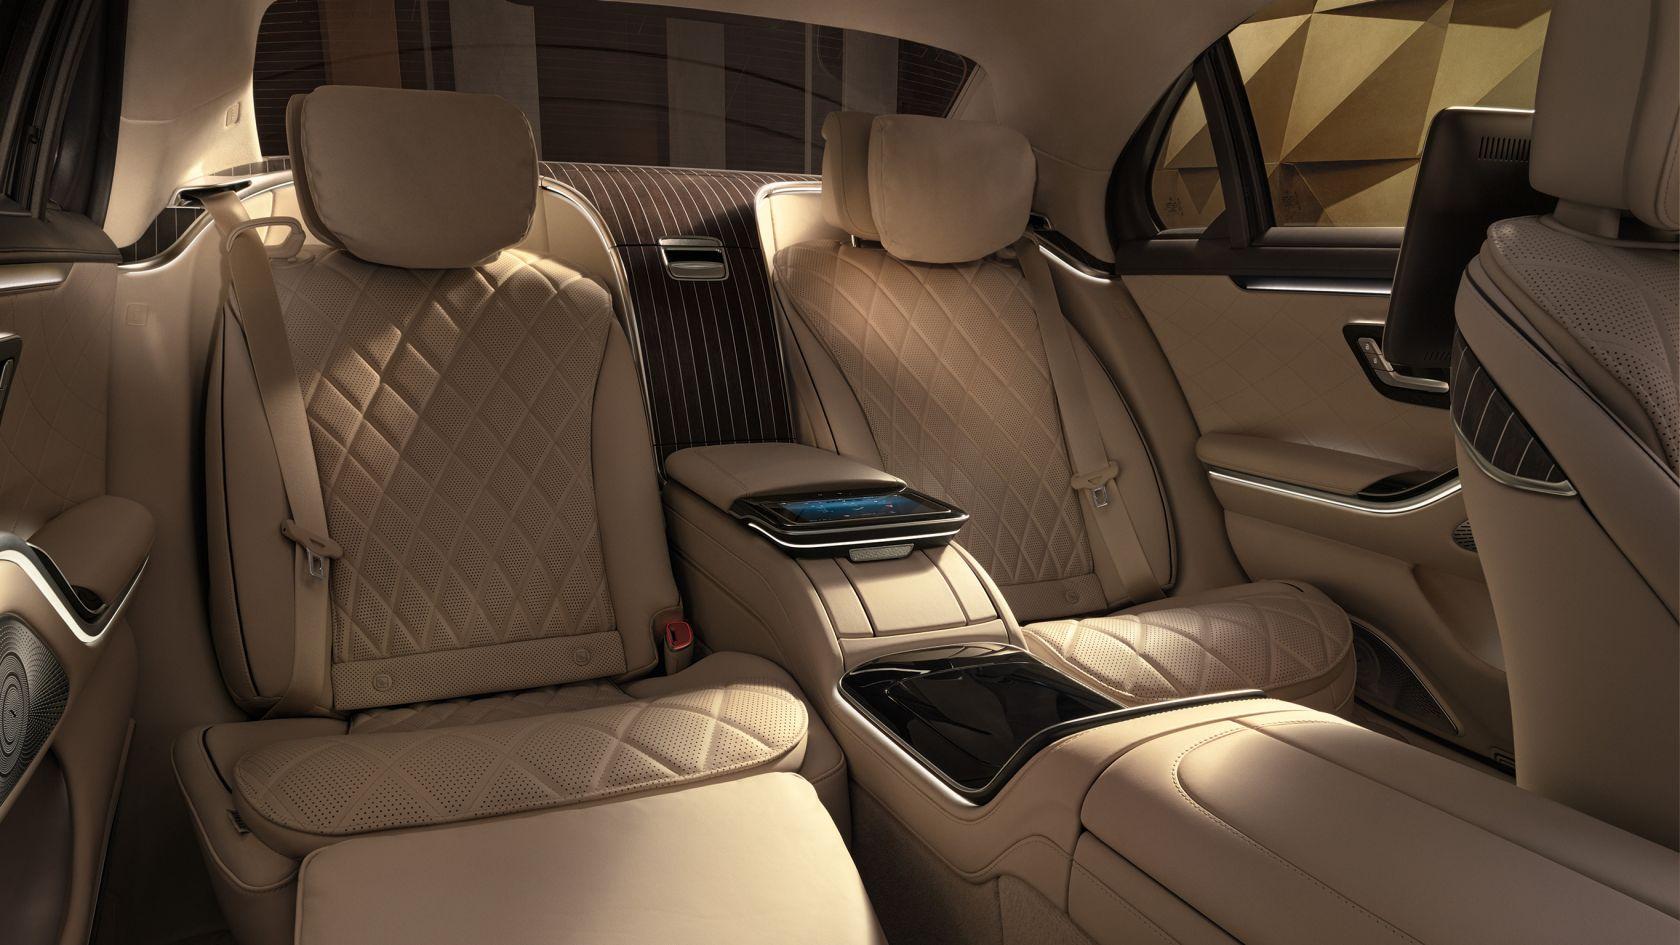 interni Mercedes Classe S W223 m.y. 2021